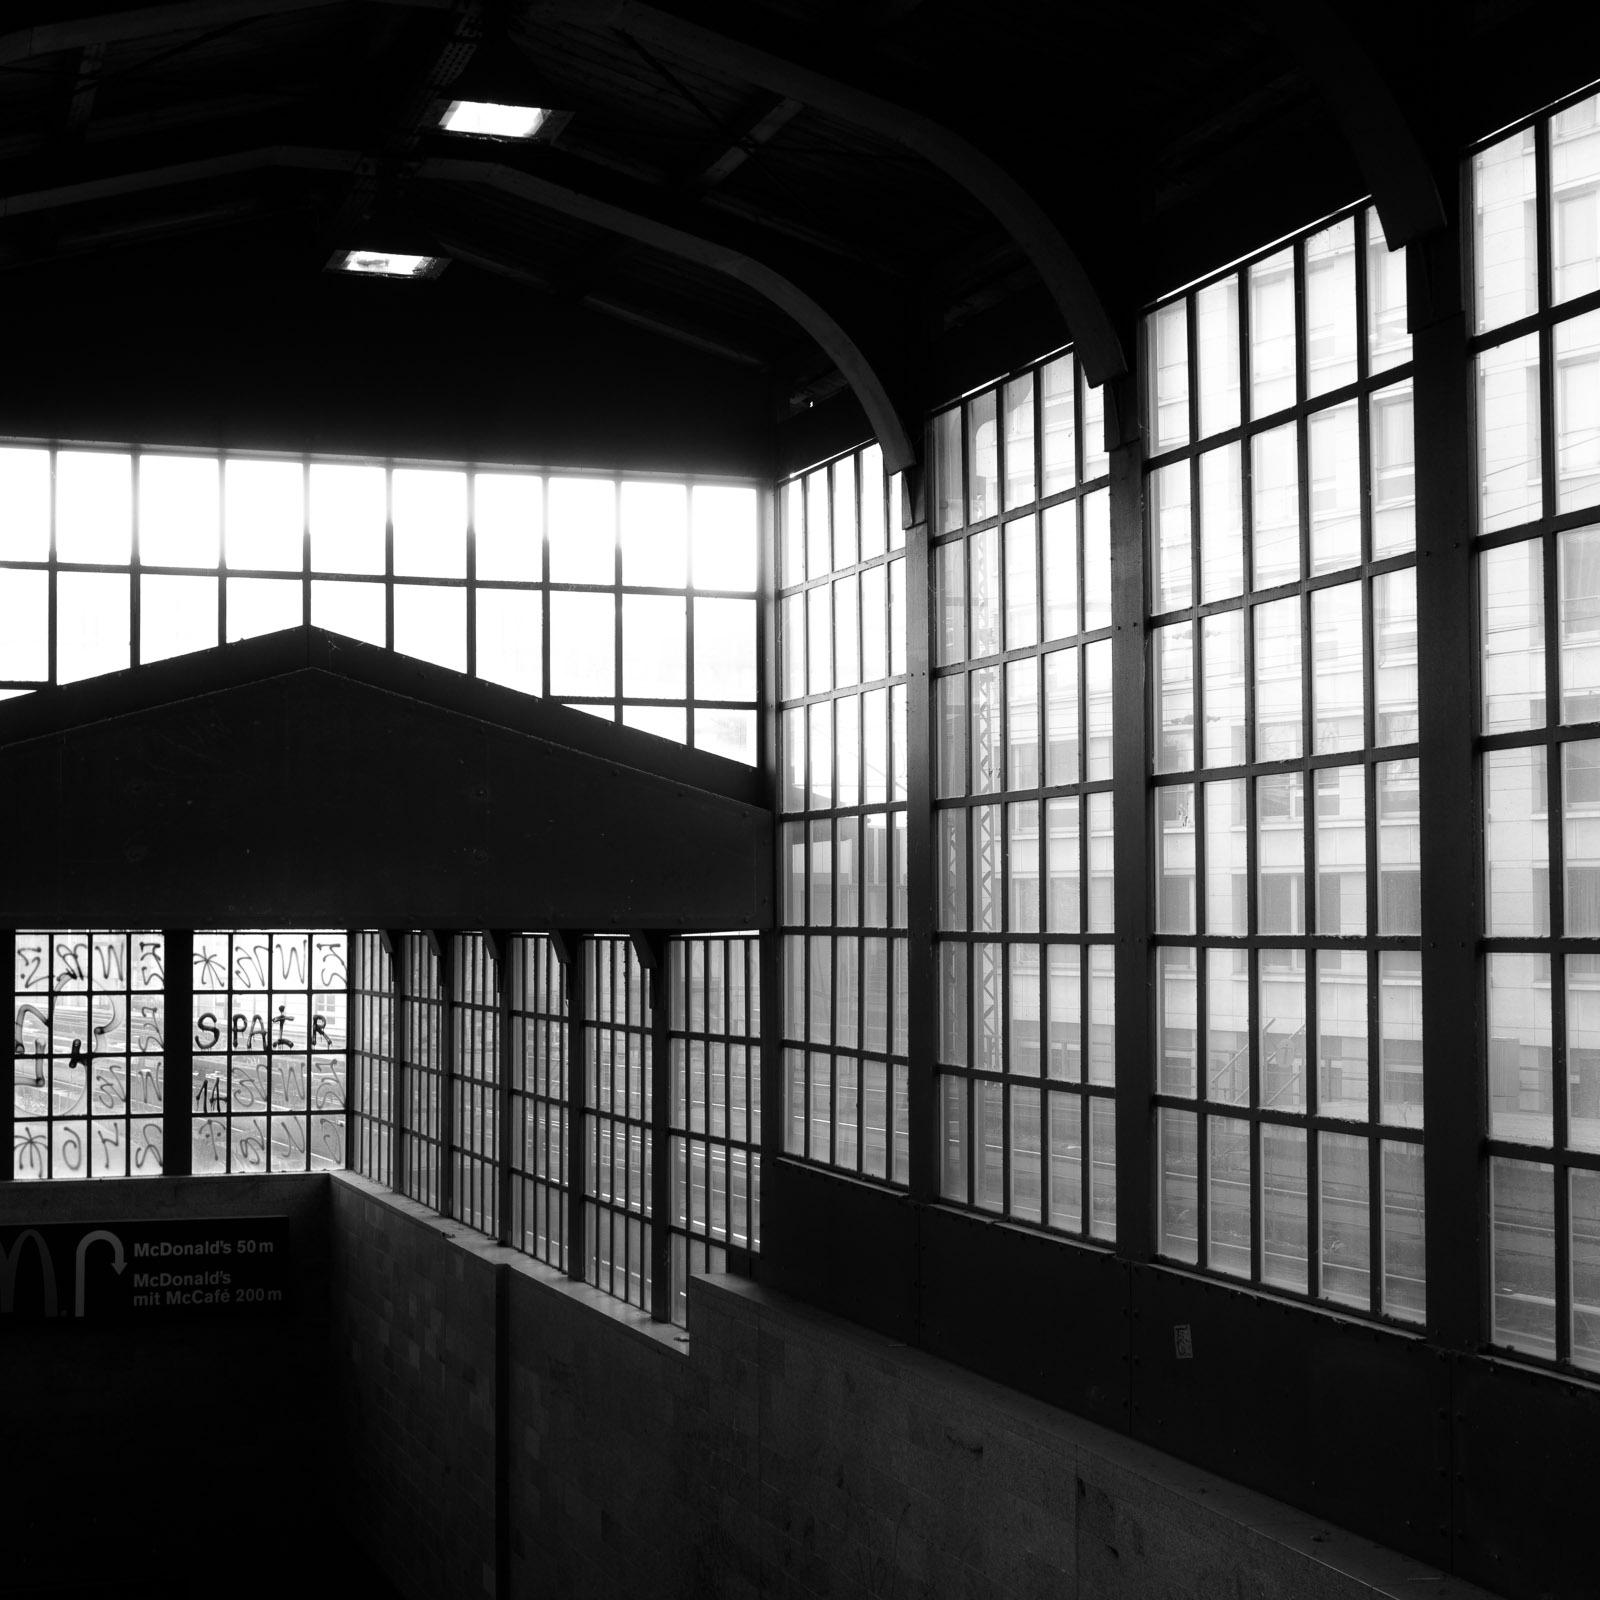 Access to railway platform, Berlin